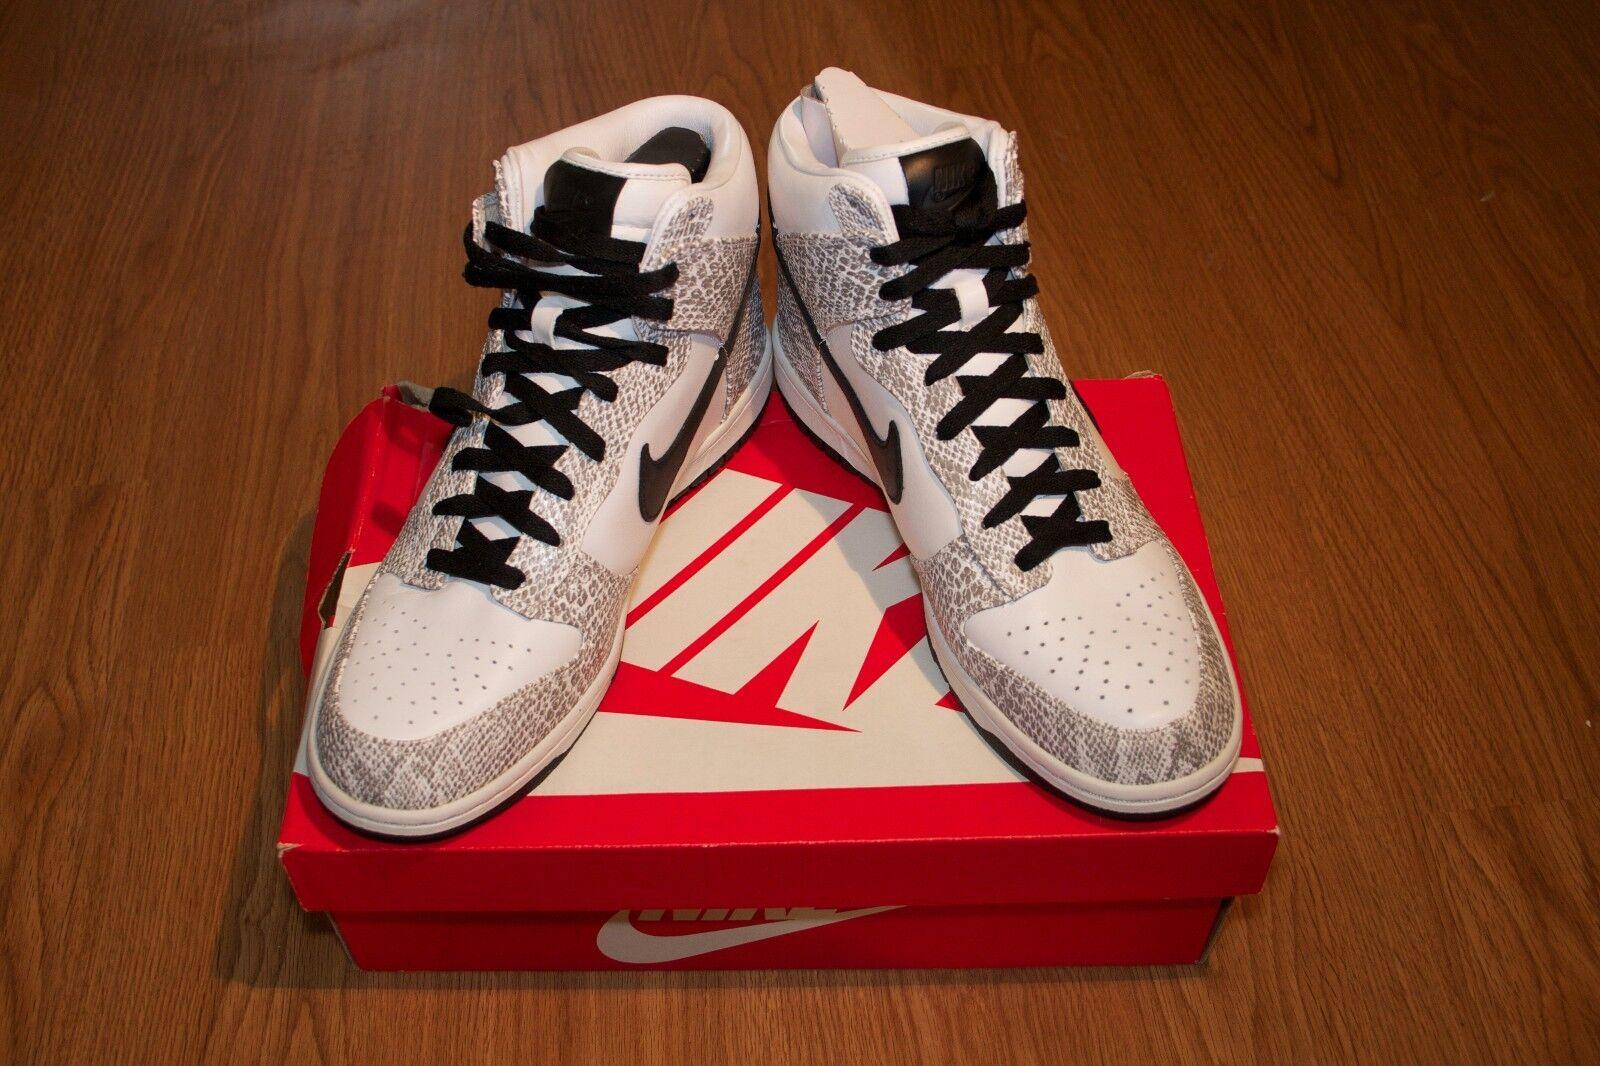 Men's Nike Dunk Premium Hi SP Cocoa Cocoa Cocoa Snake Skin Size 10.5 0ba19c